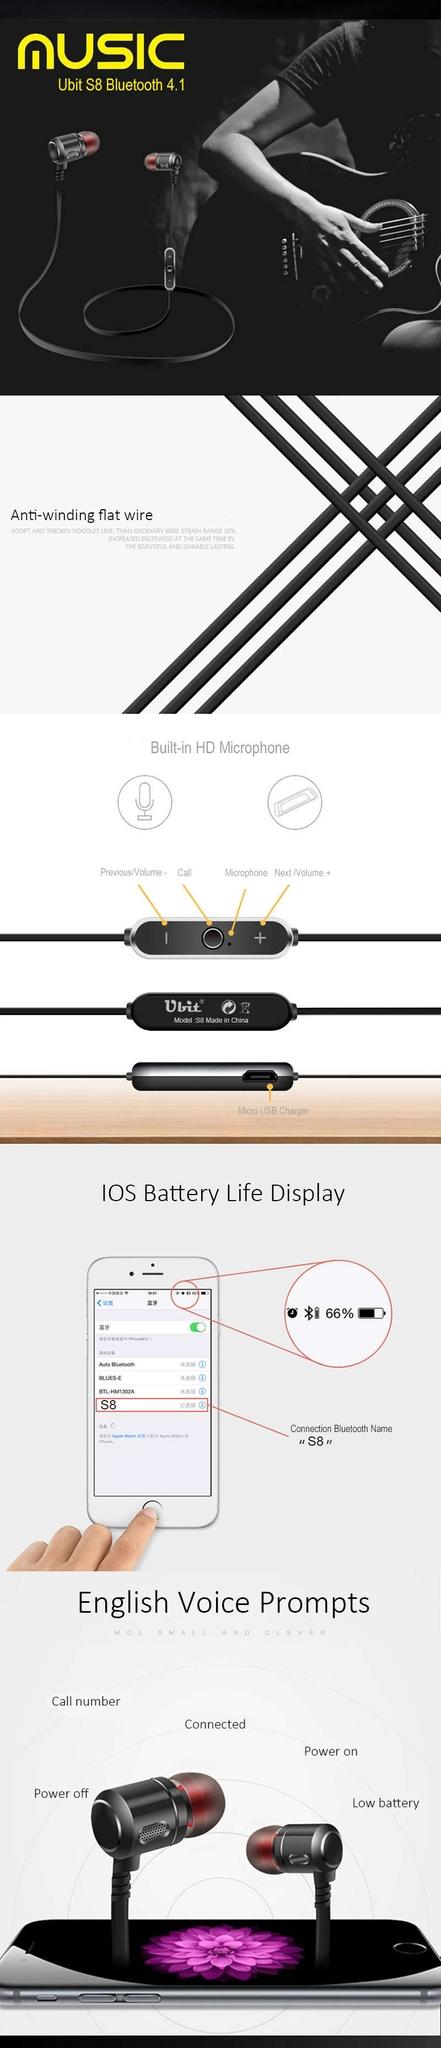 Ubit S8 Bluetooth Earphone (4)